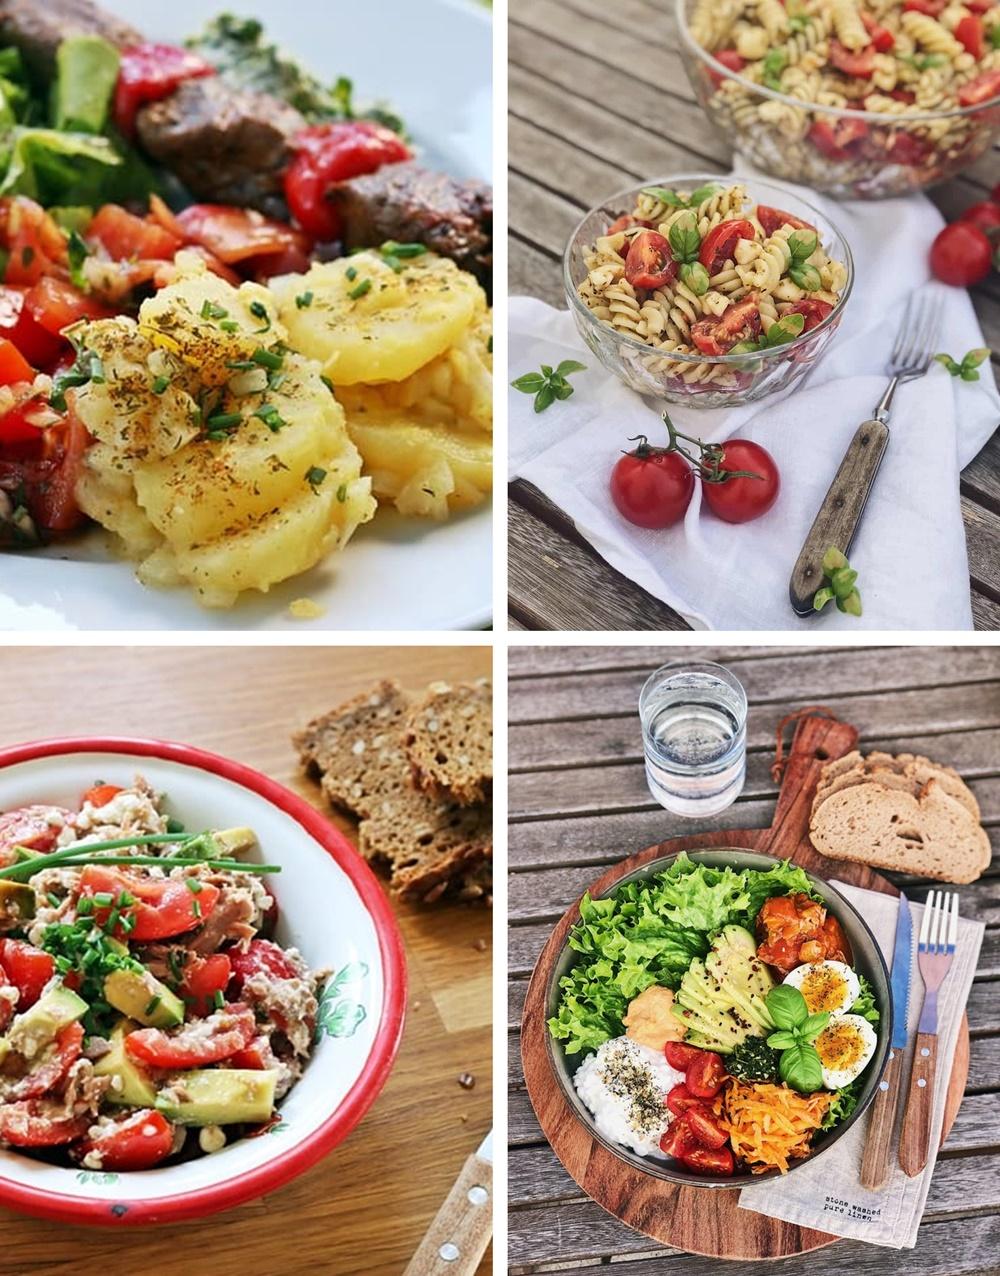 Die besten Brote, Salate, Snacks & Drinks für die Grillsaison salat nudelsalat salatbowl kartoffelsalat